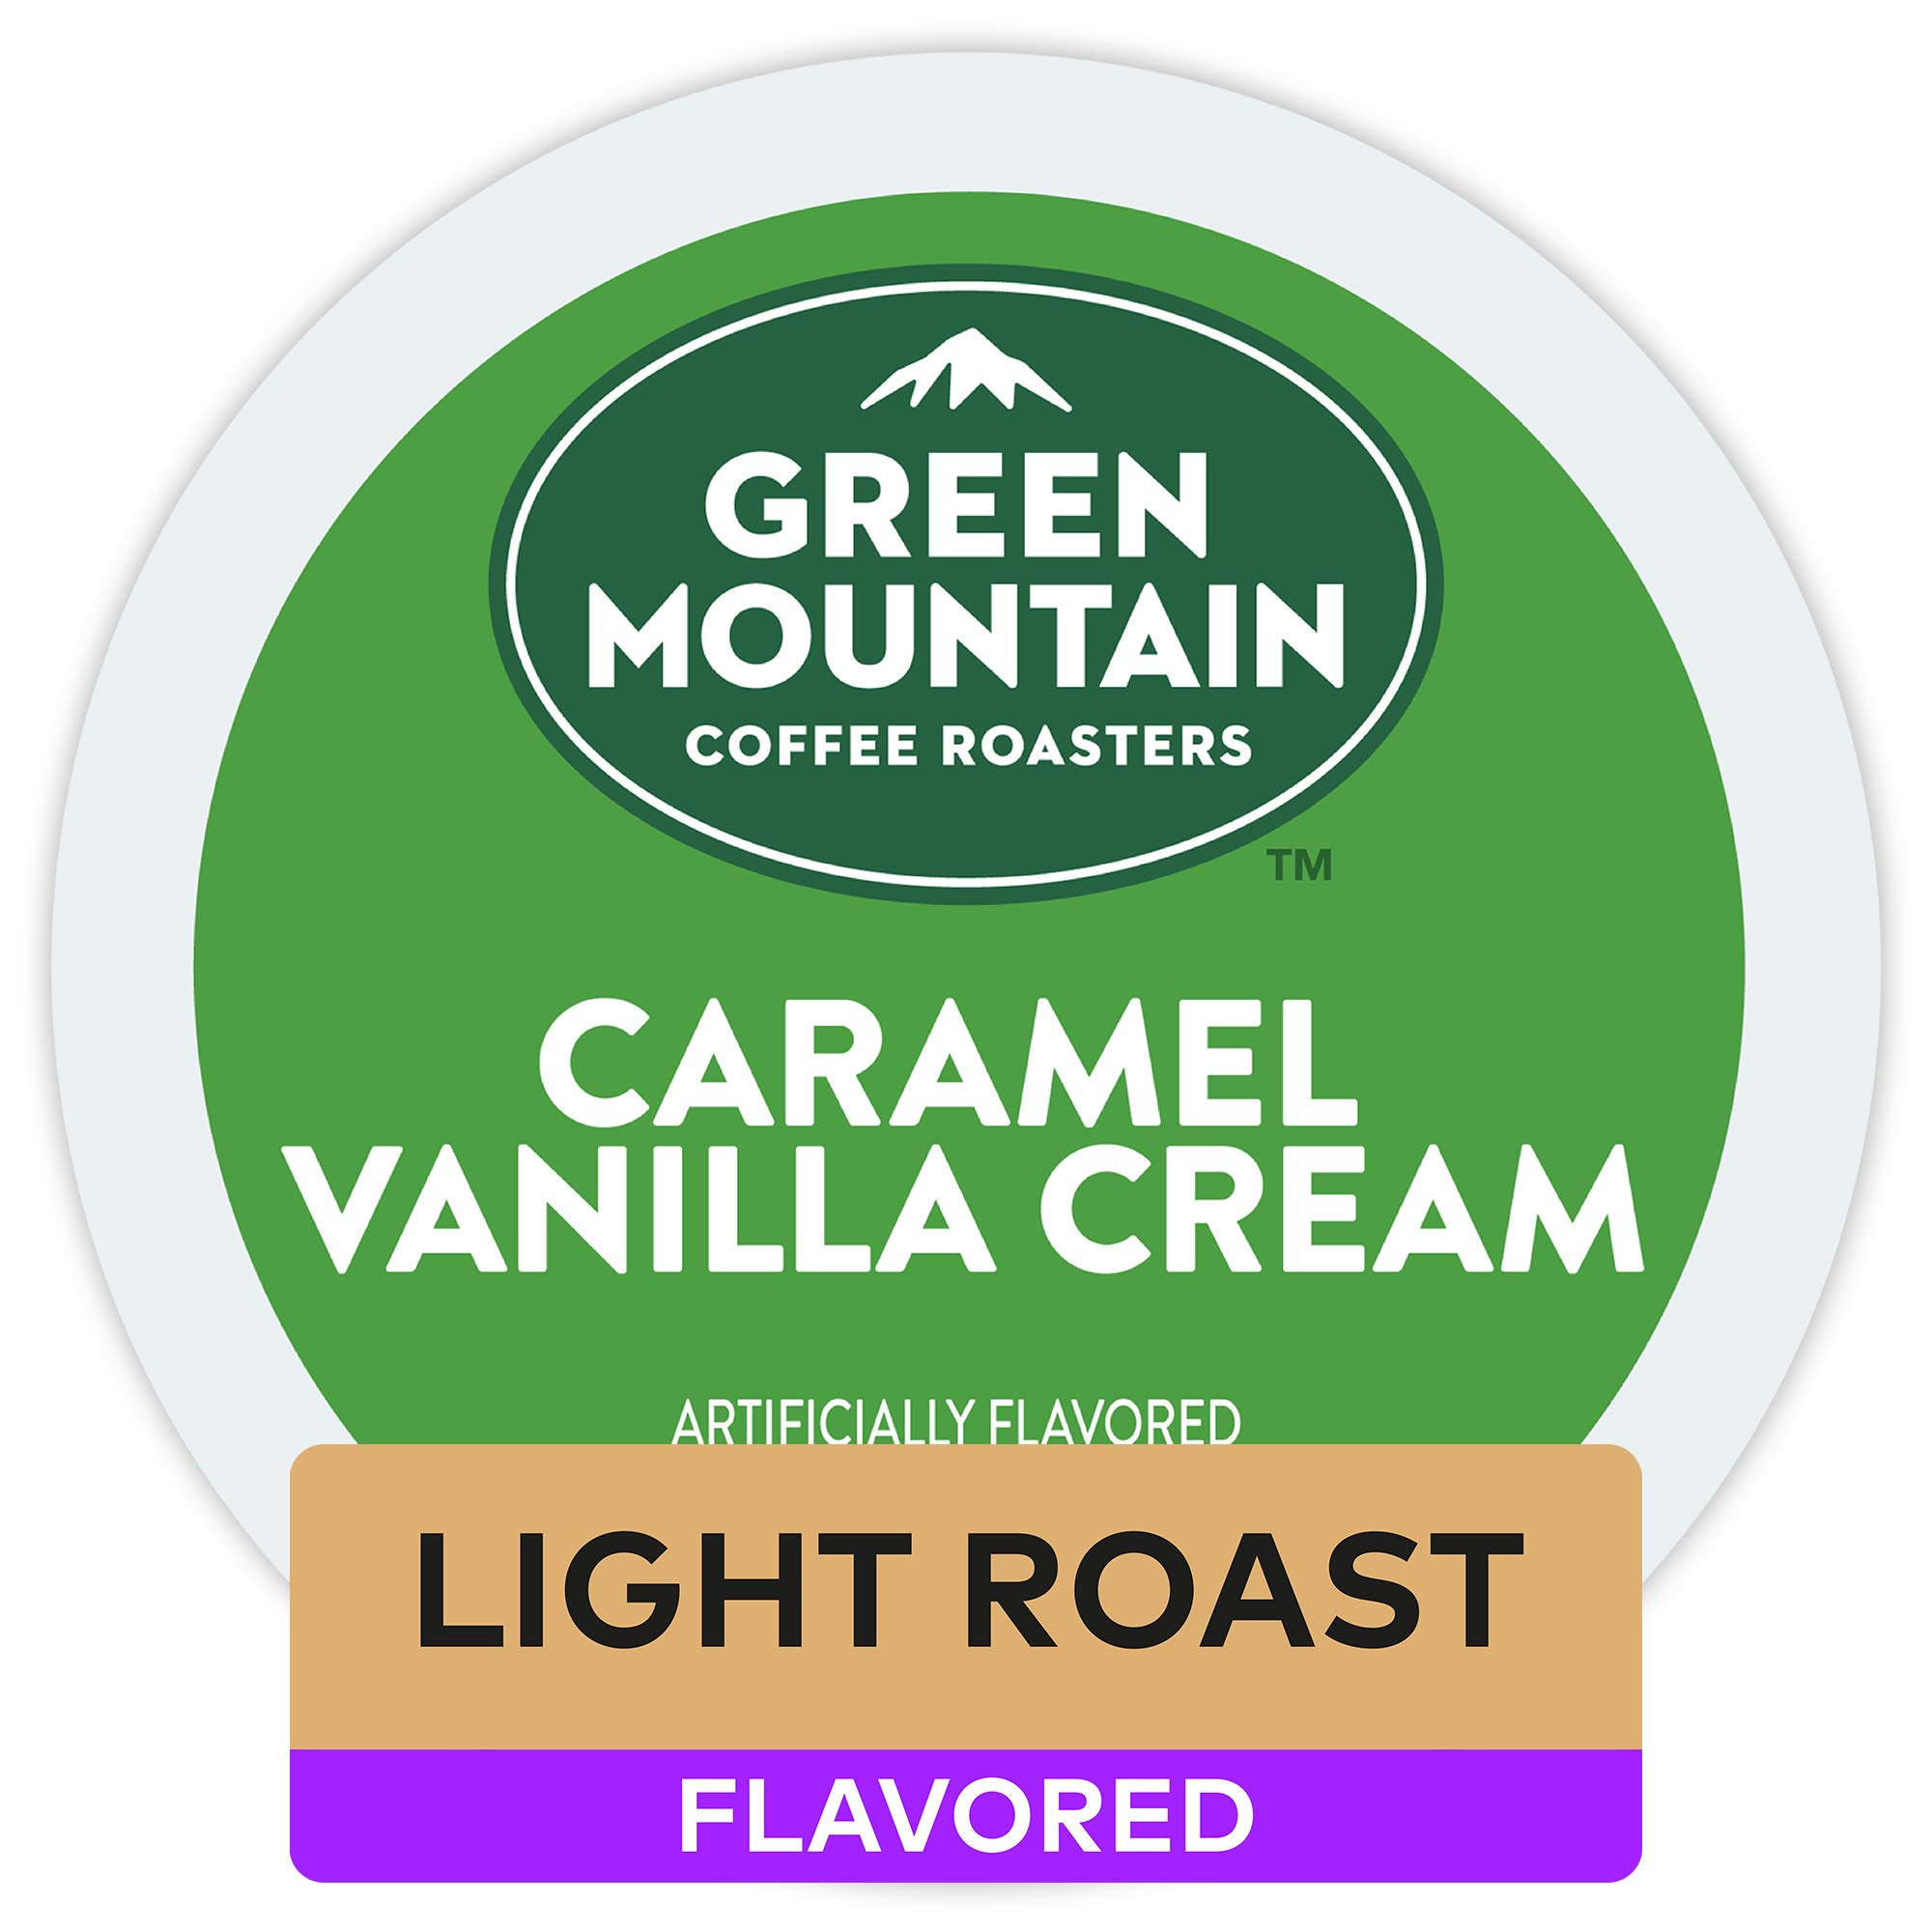 Green Mountain Coffee Roasters Caramel Vanilla Cream, Single Serve Coffee K-Cup Pod, Flavored Coffee, 12 count (Pack of 6), 72 Count by Green Mountain Coffee Roasters